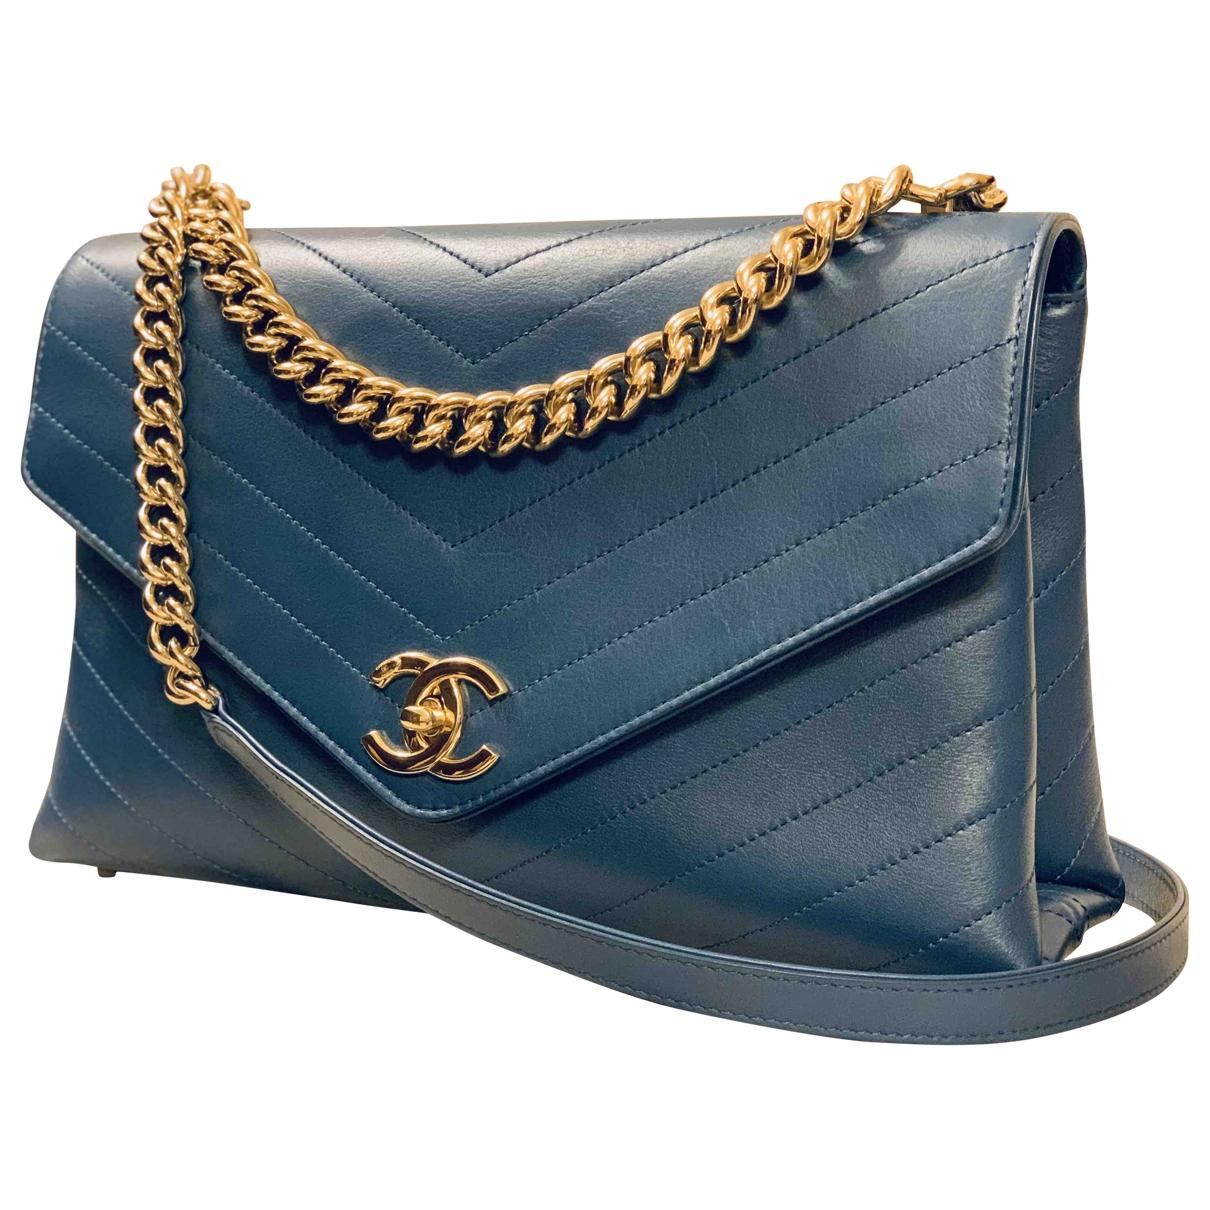 Chanel \N Handtasche in  Blau Leder